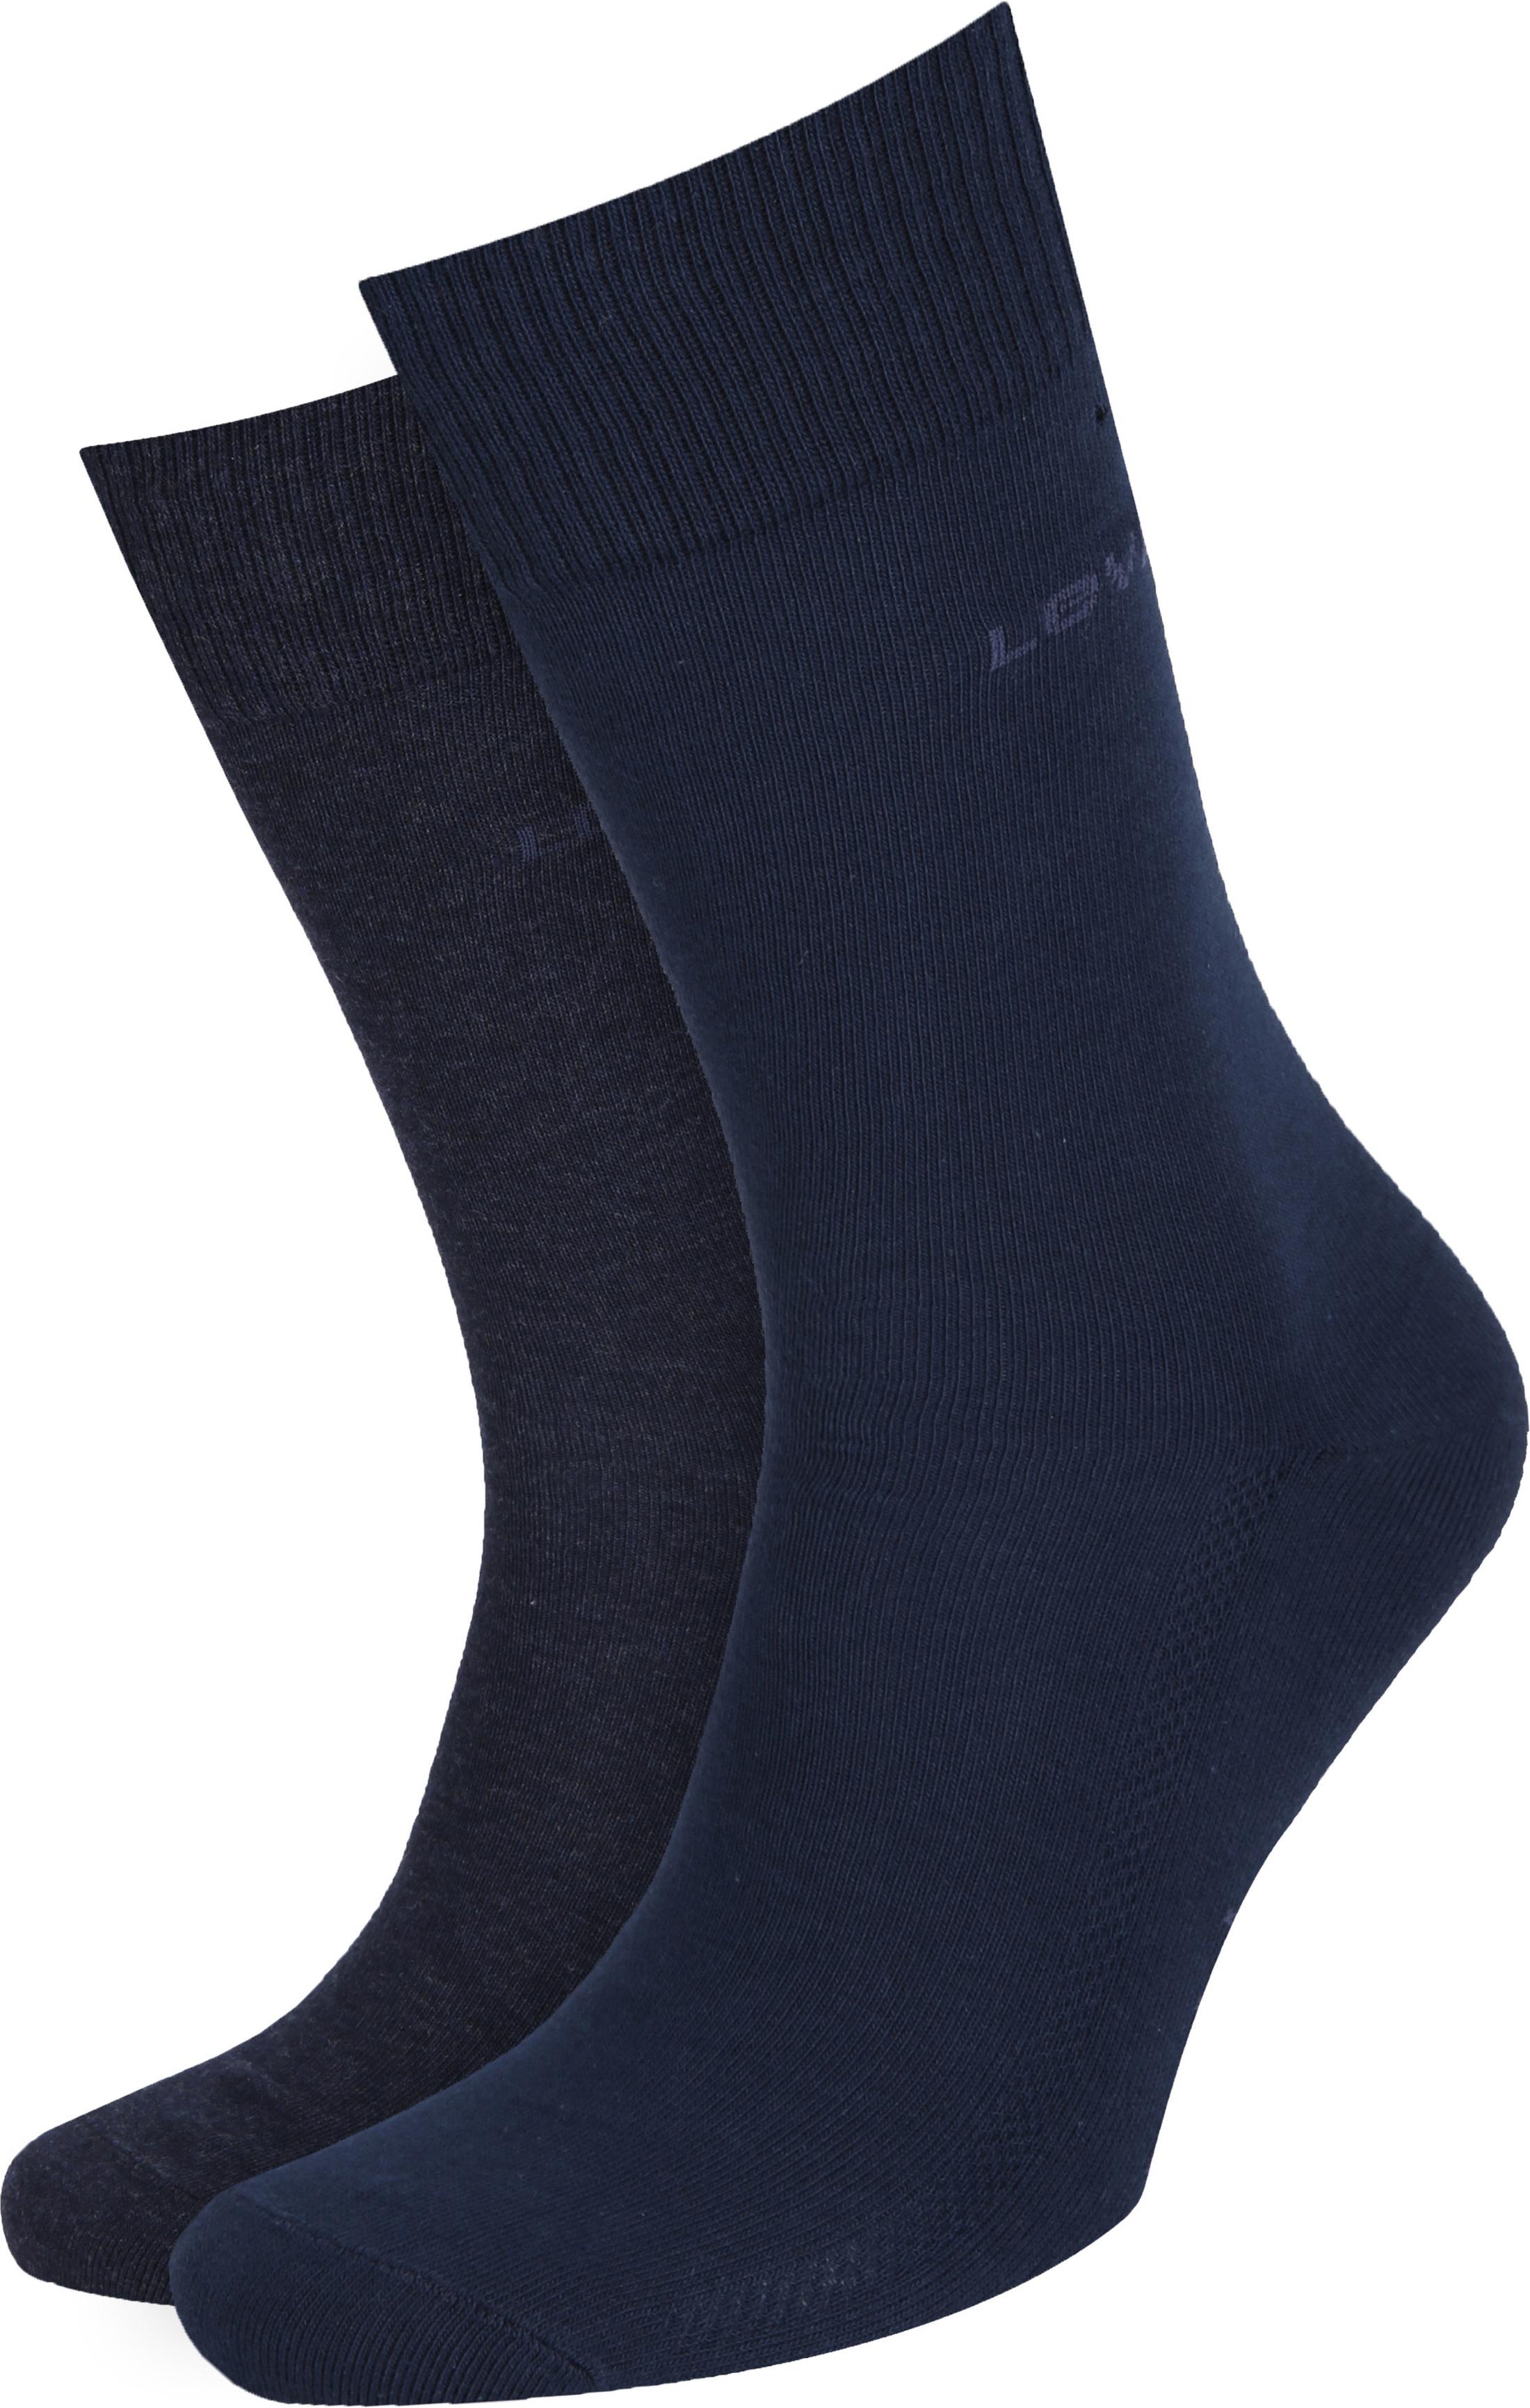 Levi's Socken Baumwolle 2-Pack Navy 321